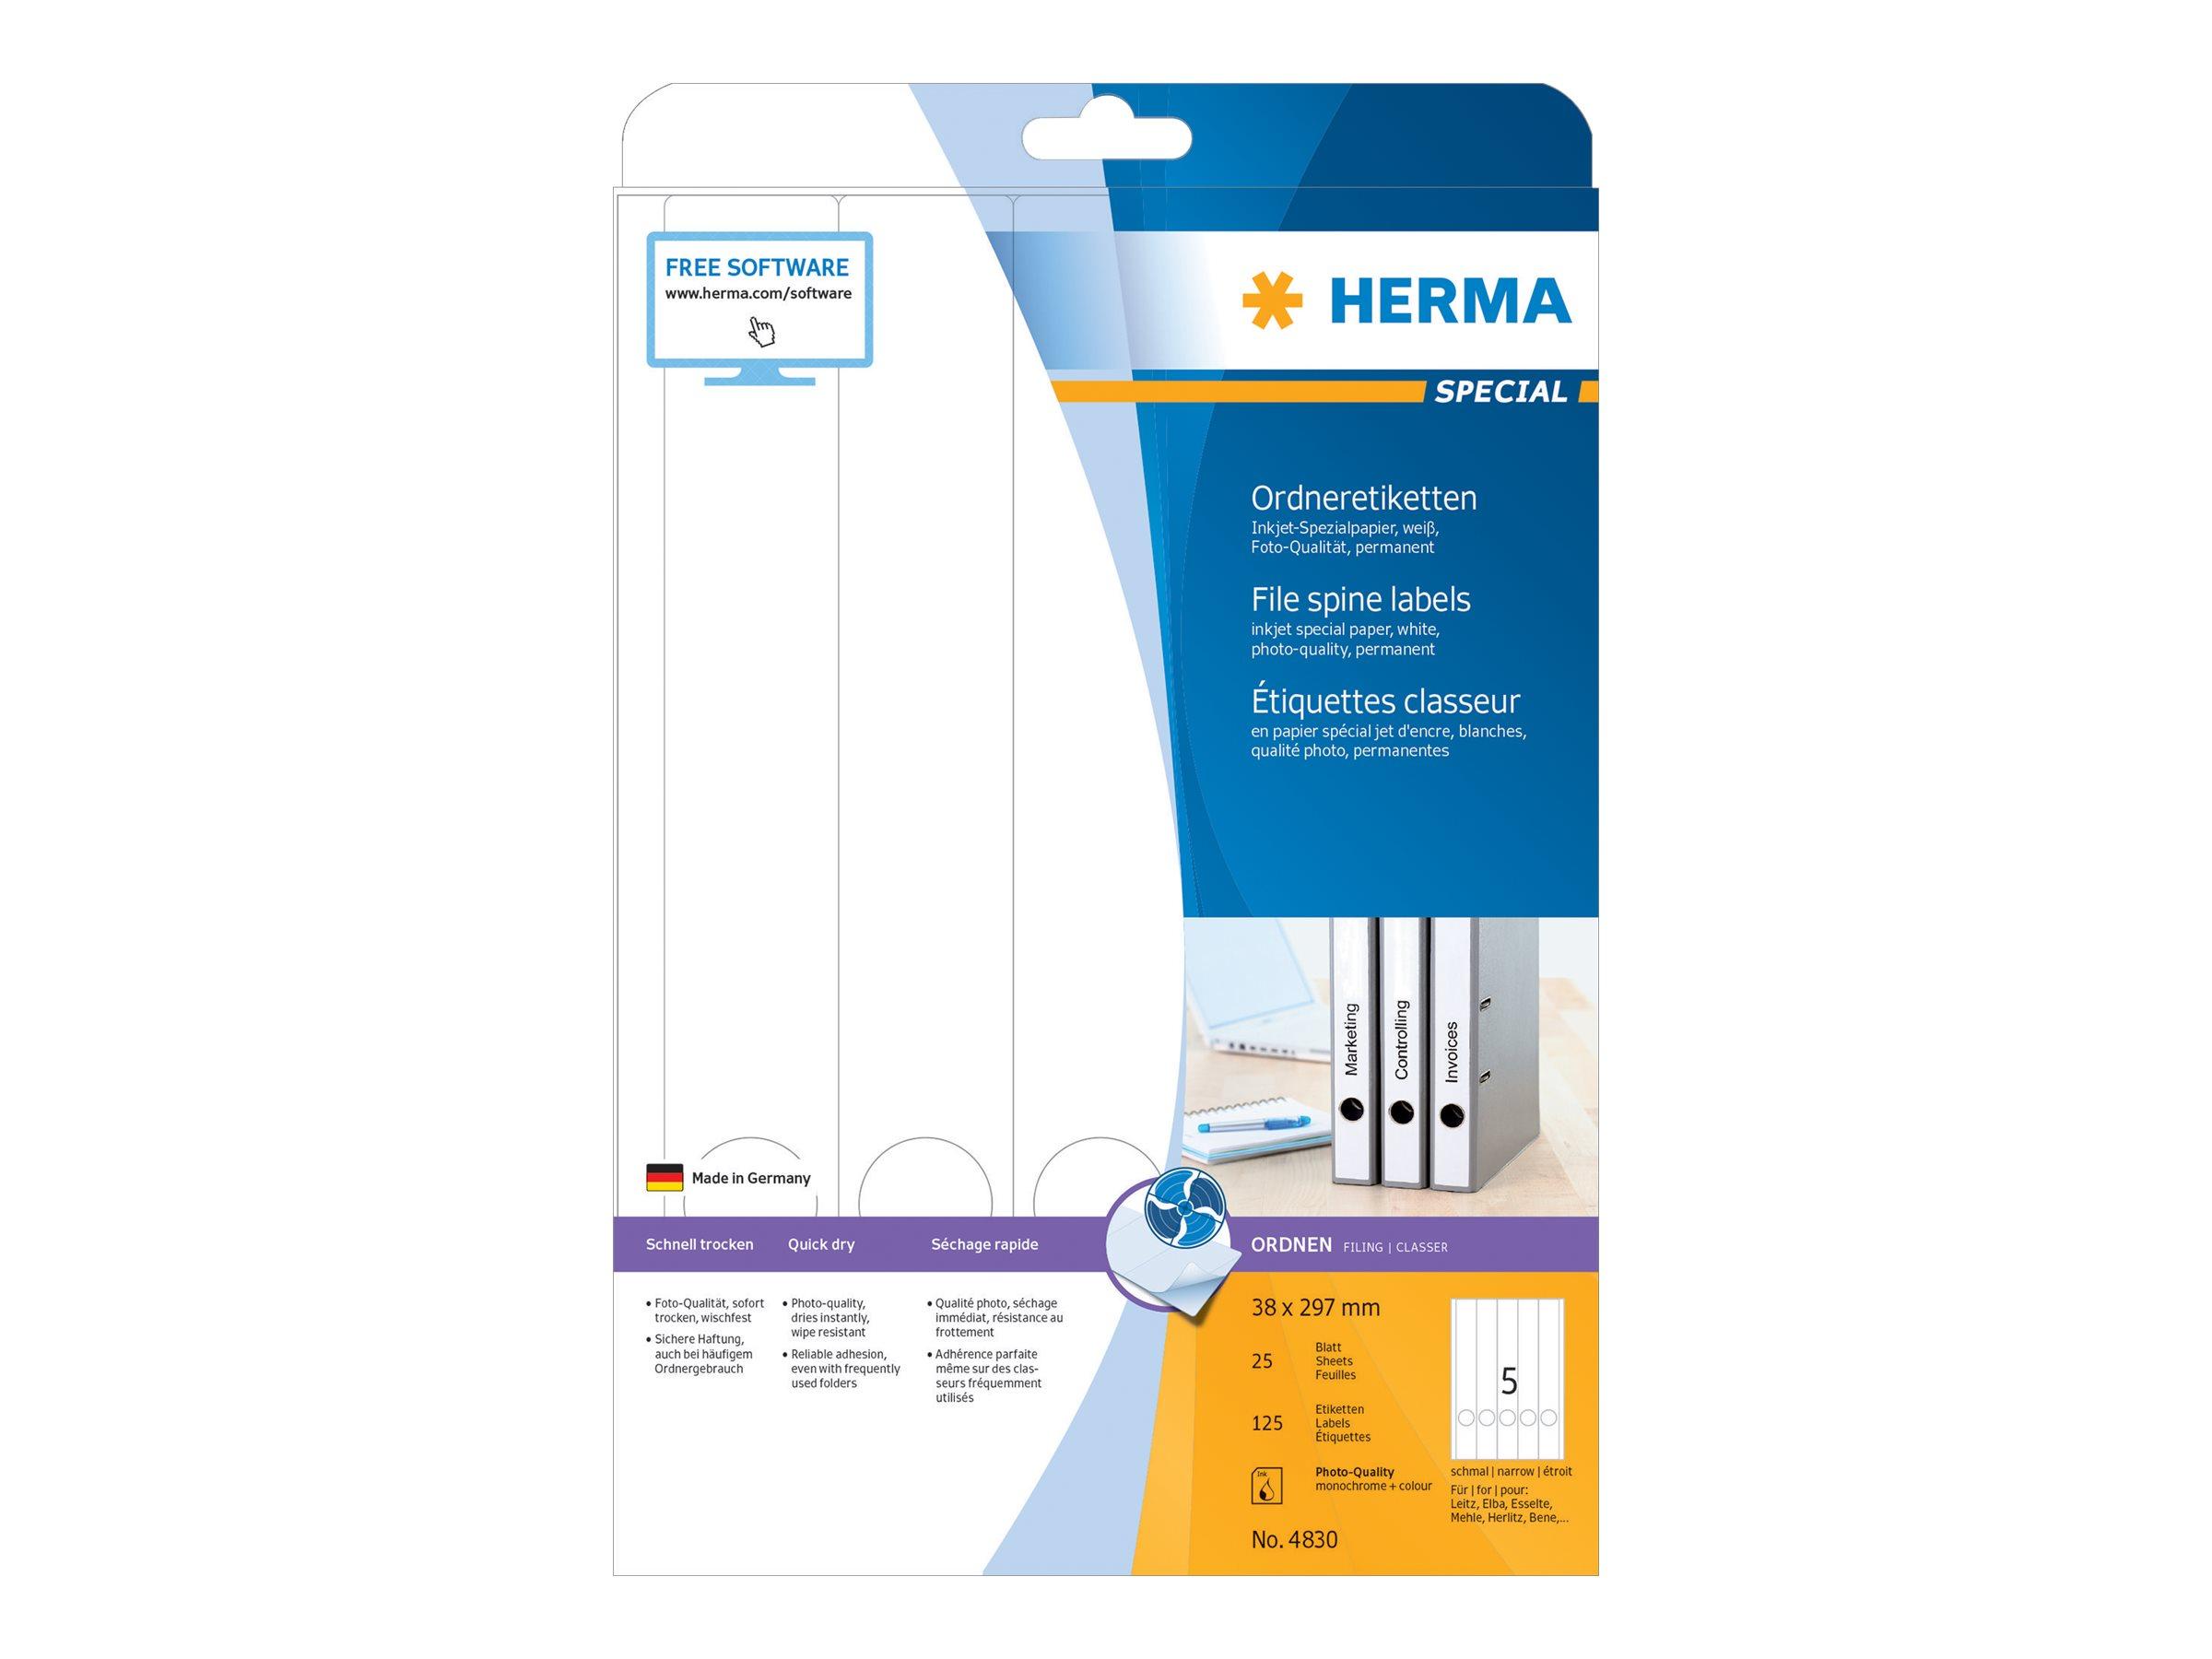 HERMA Special - Papier - matt - permanent selbstklebend - beschichtet - weiß - 38 x 297 mm - 90 g/m² - 125 Etikett(en) (25 Bogen x 5)